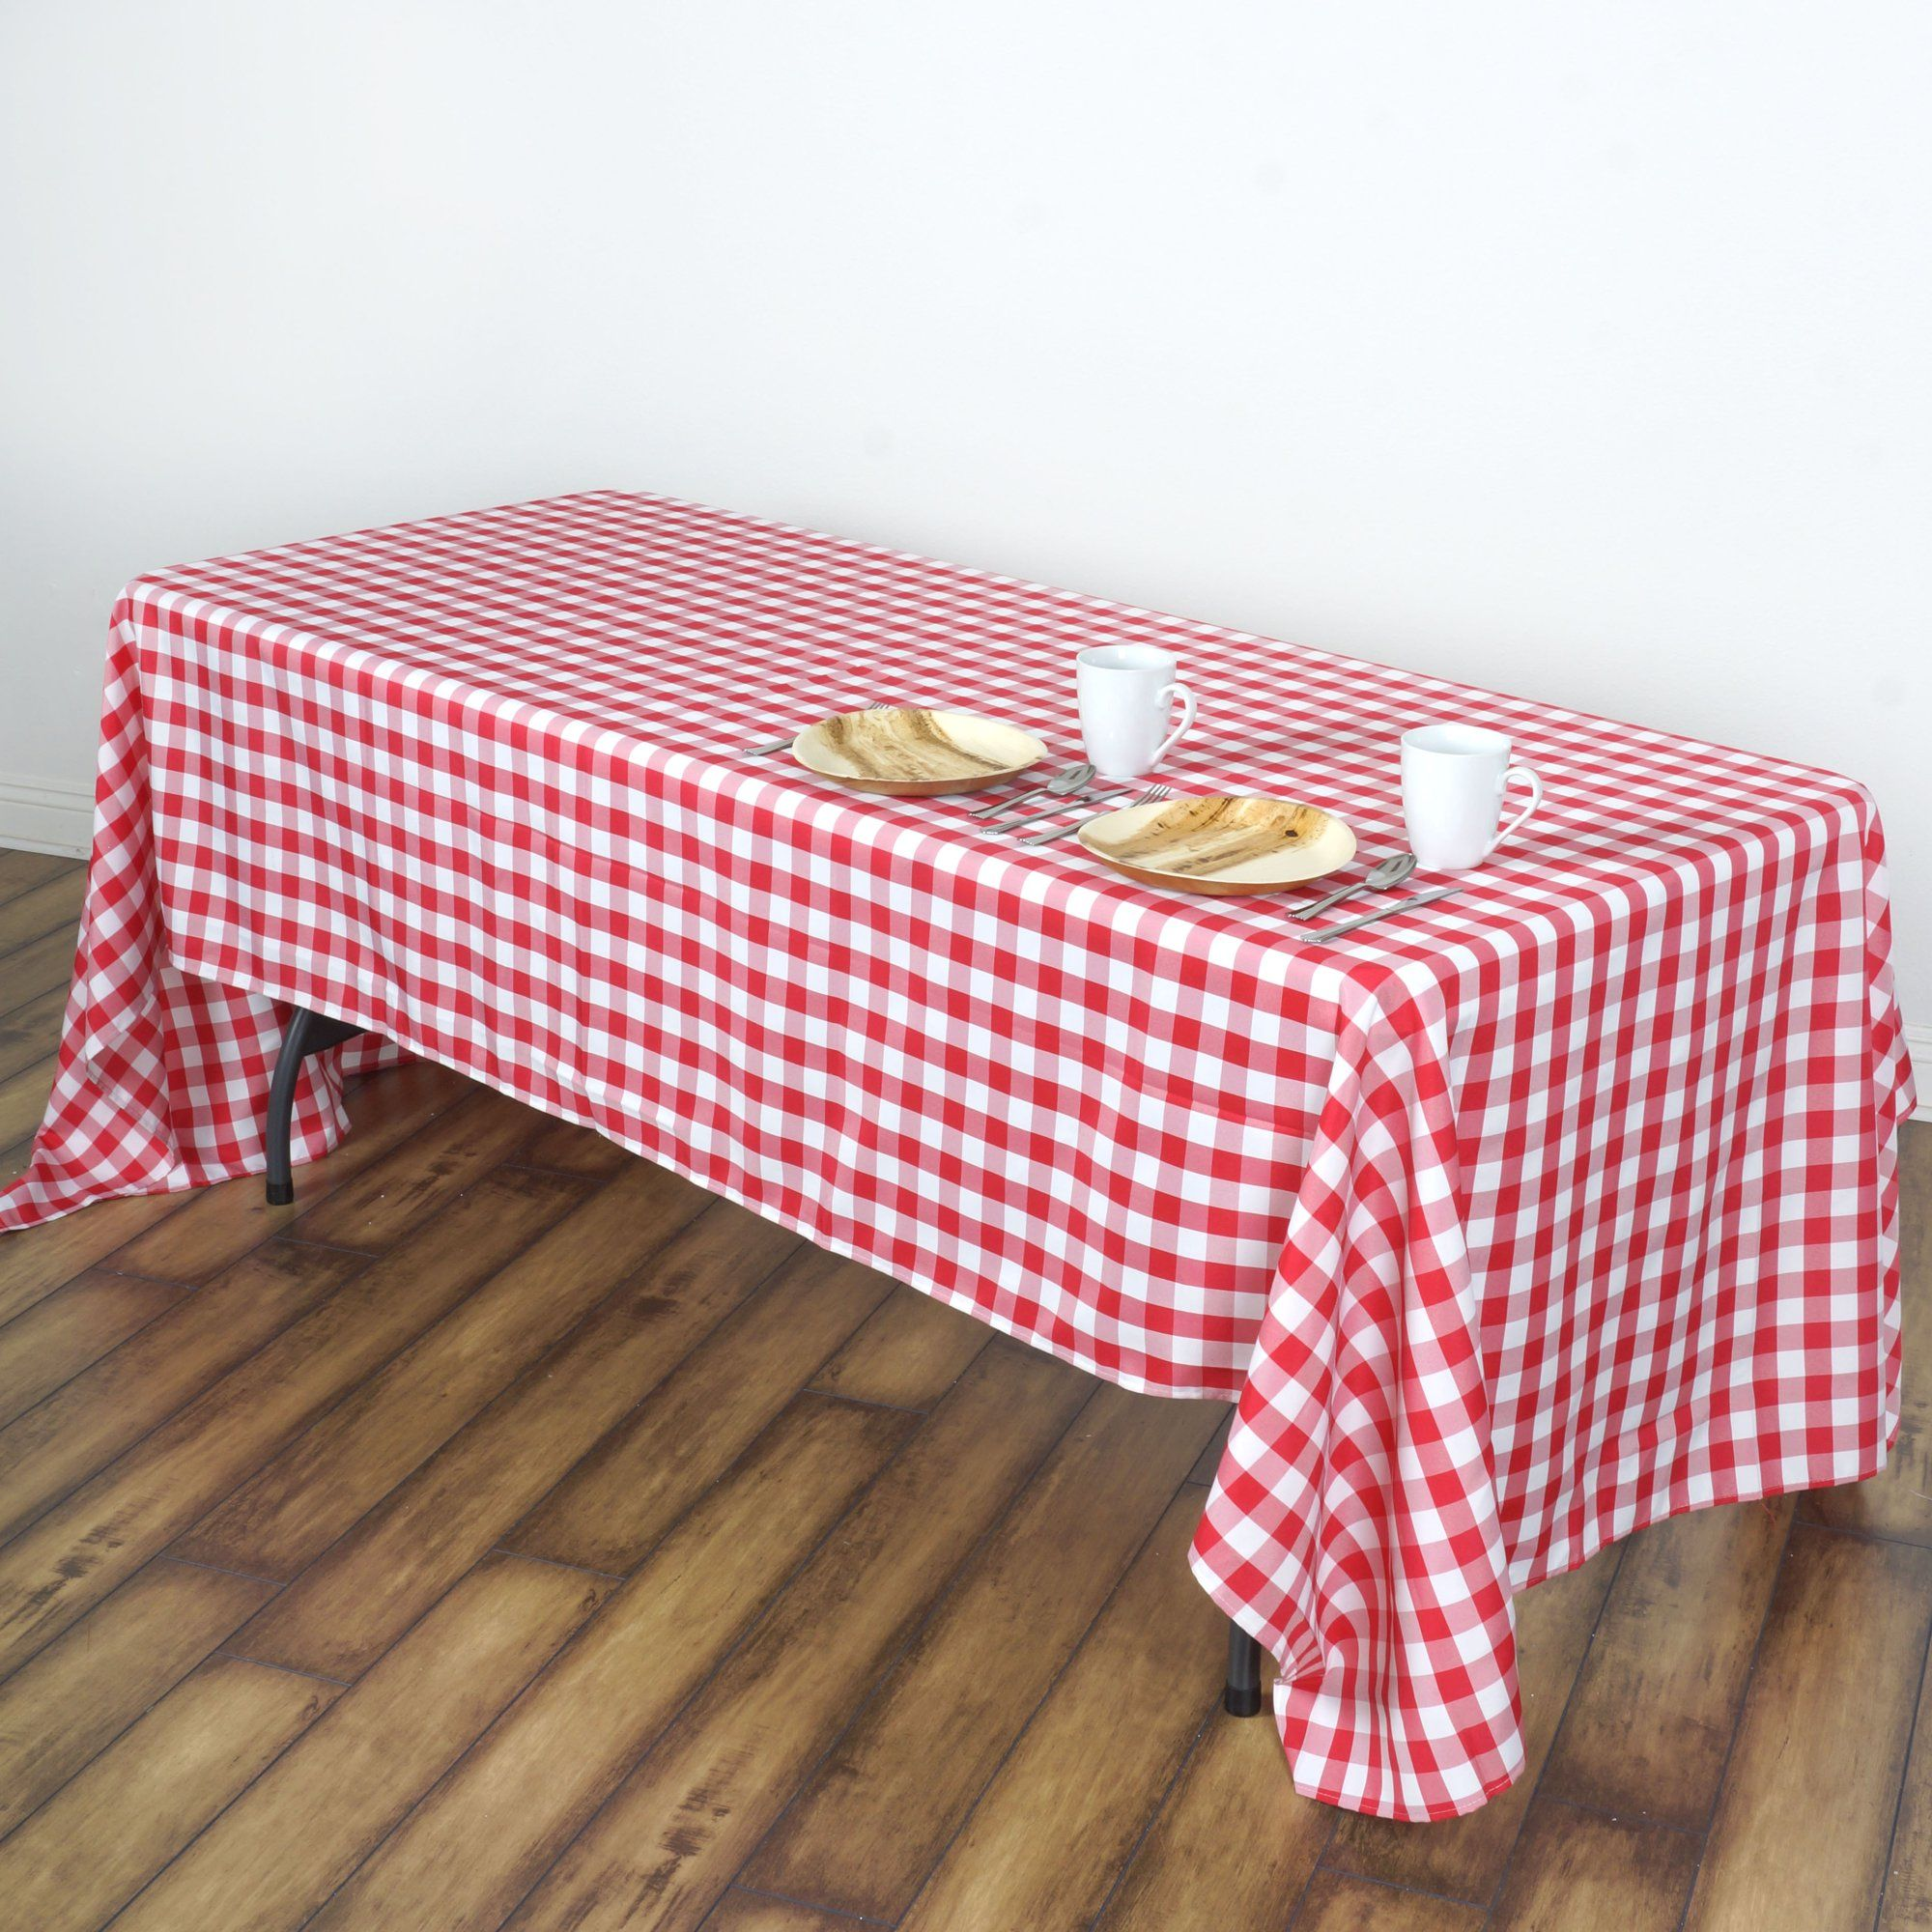 Balsacircle 60 X 102 Gingham Checkered Polyester Tablecloth For Garden Party Wedding Reception Catering Dining Table Linens Walmart Com Checkered Tablecloth Plaid Tablecloth Table Cloth